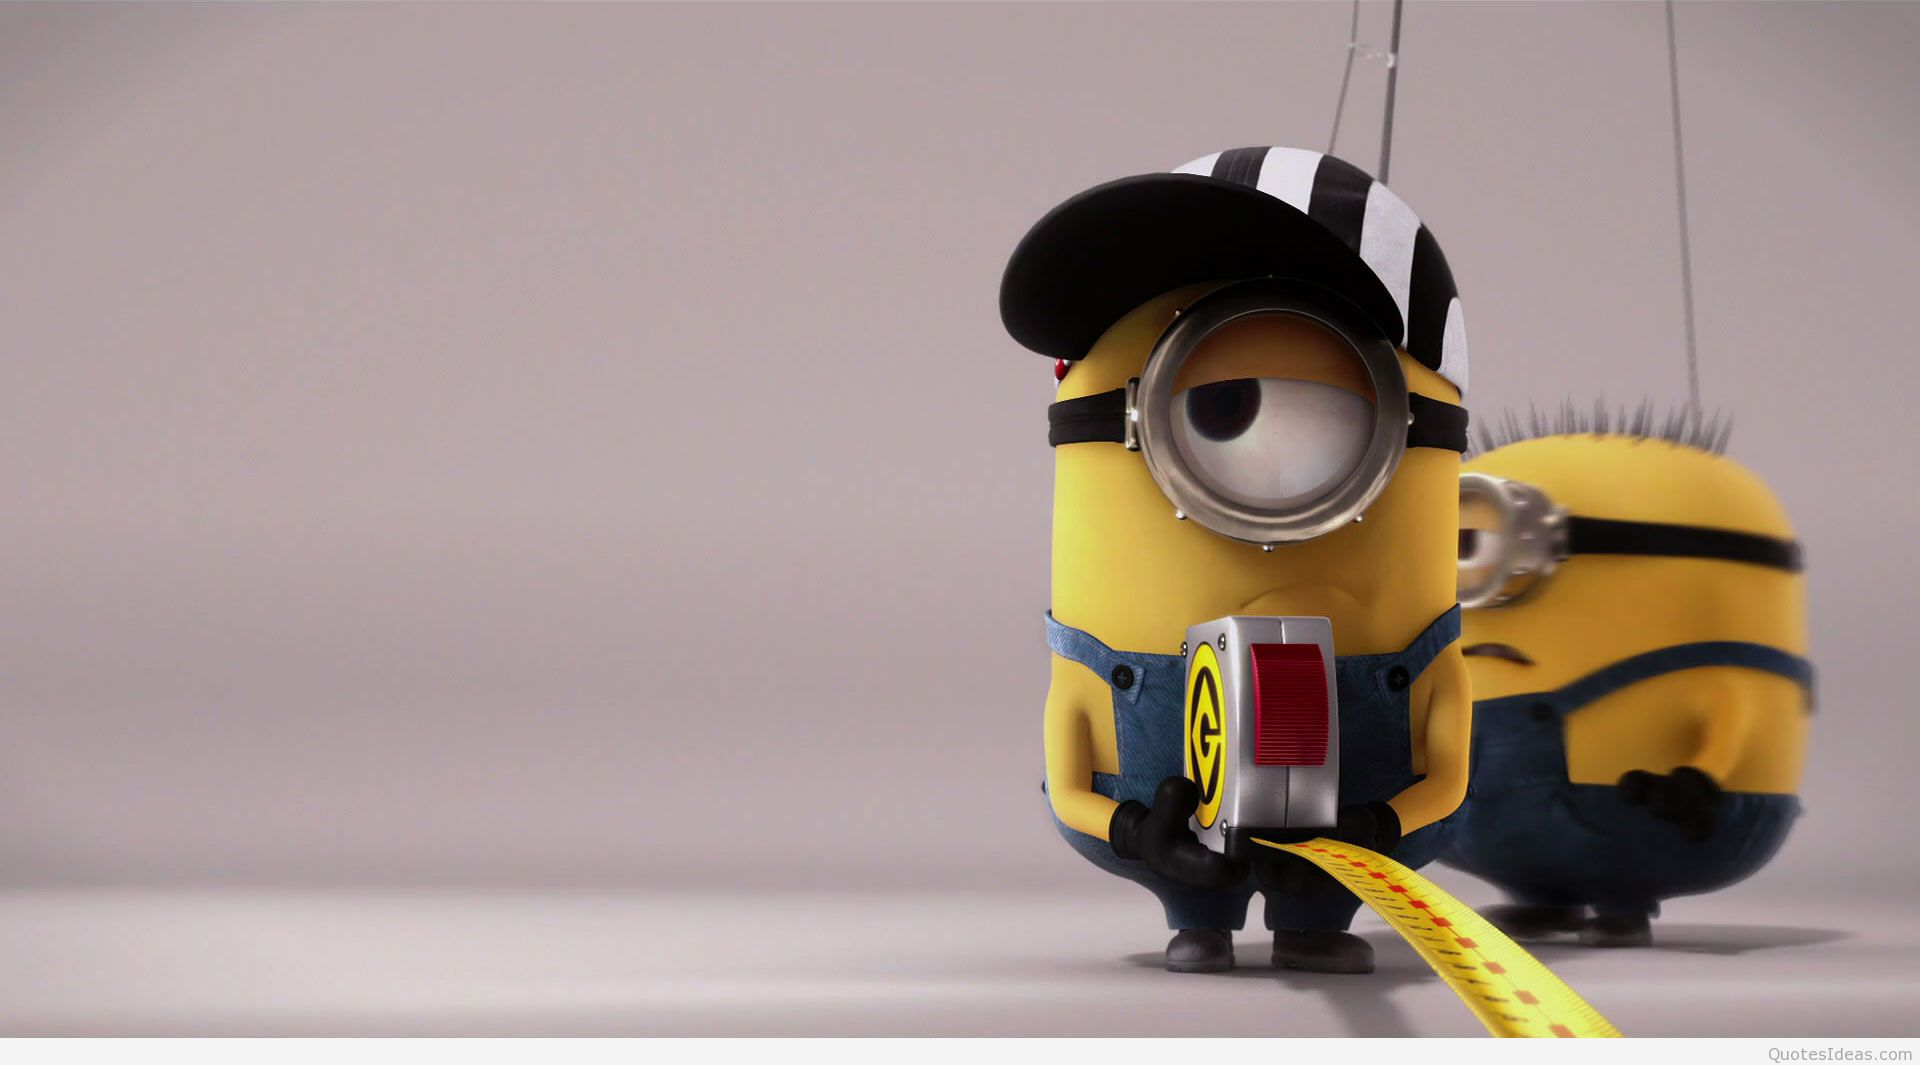 Top Ten Gambar Kartun Minion Lucu Bergerak